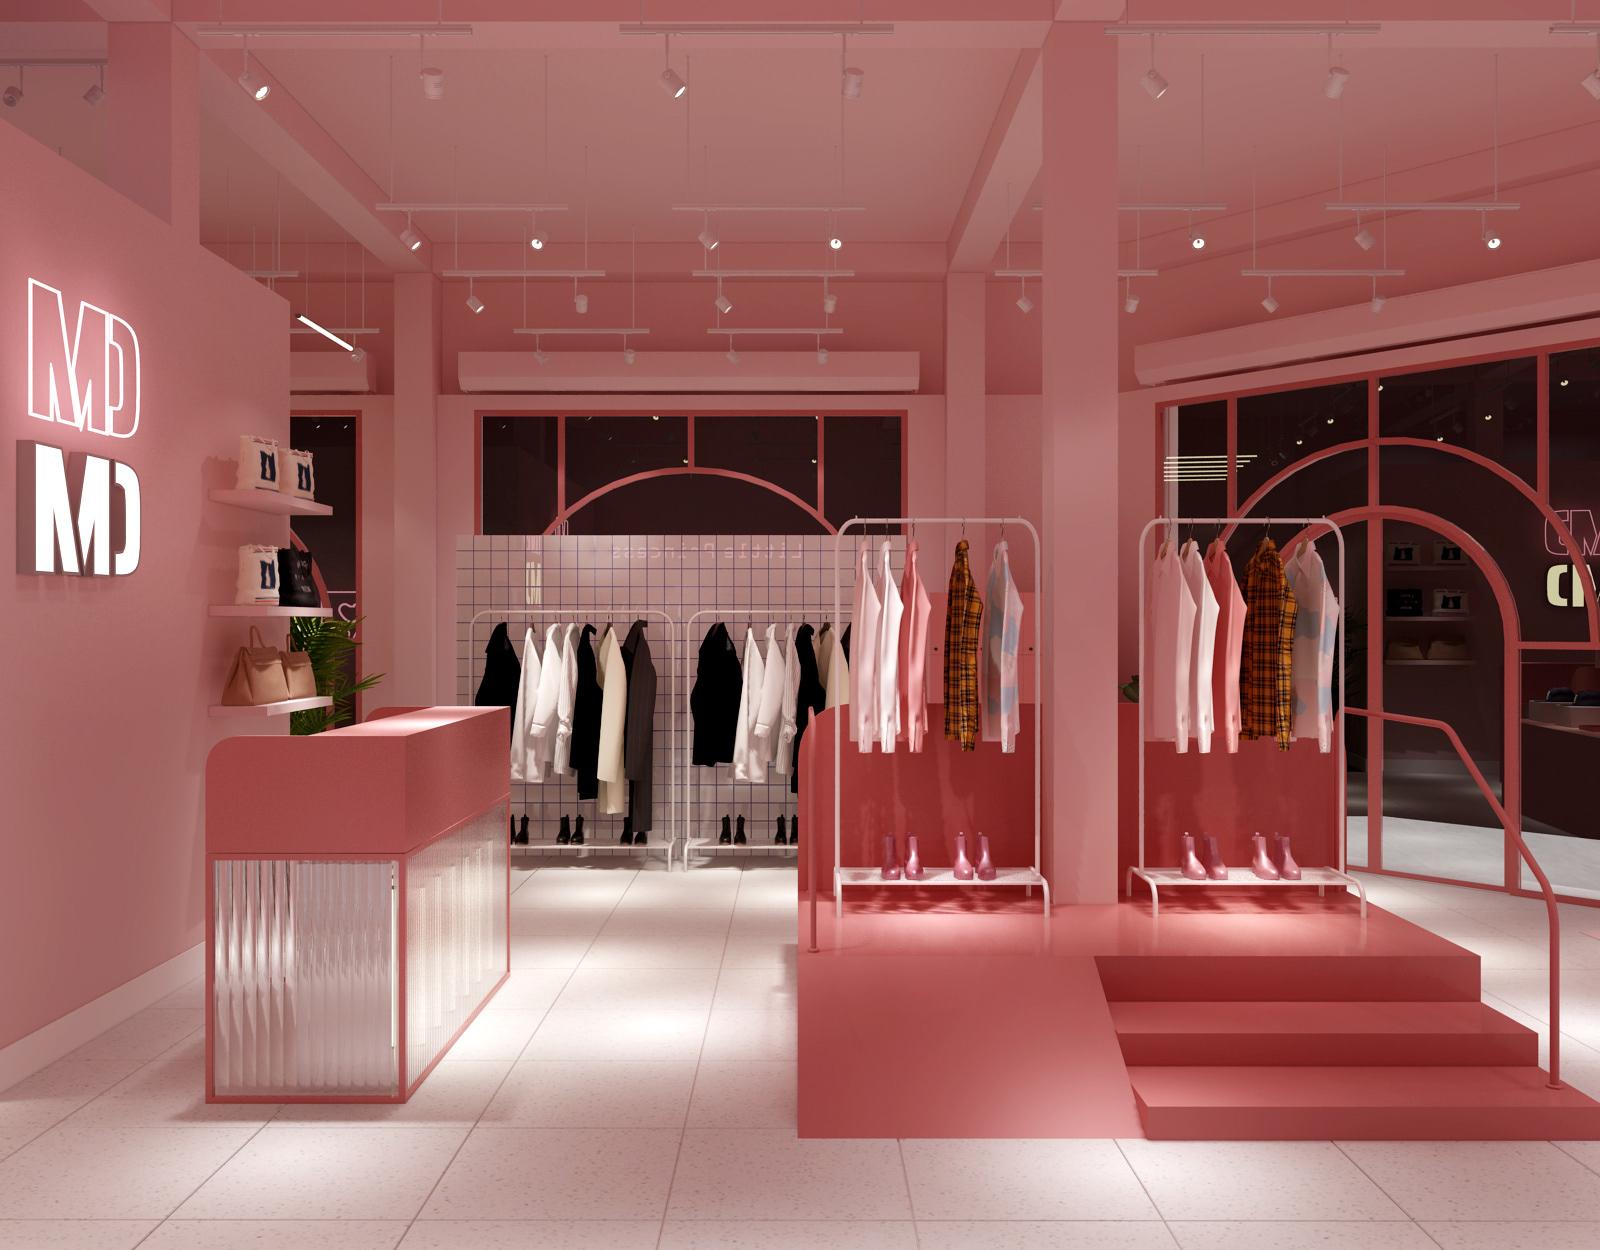 Shop Thời Trang 2 Mặt Tiền